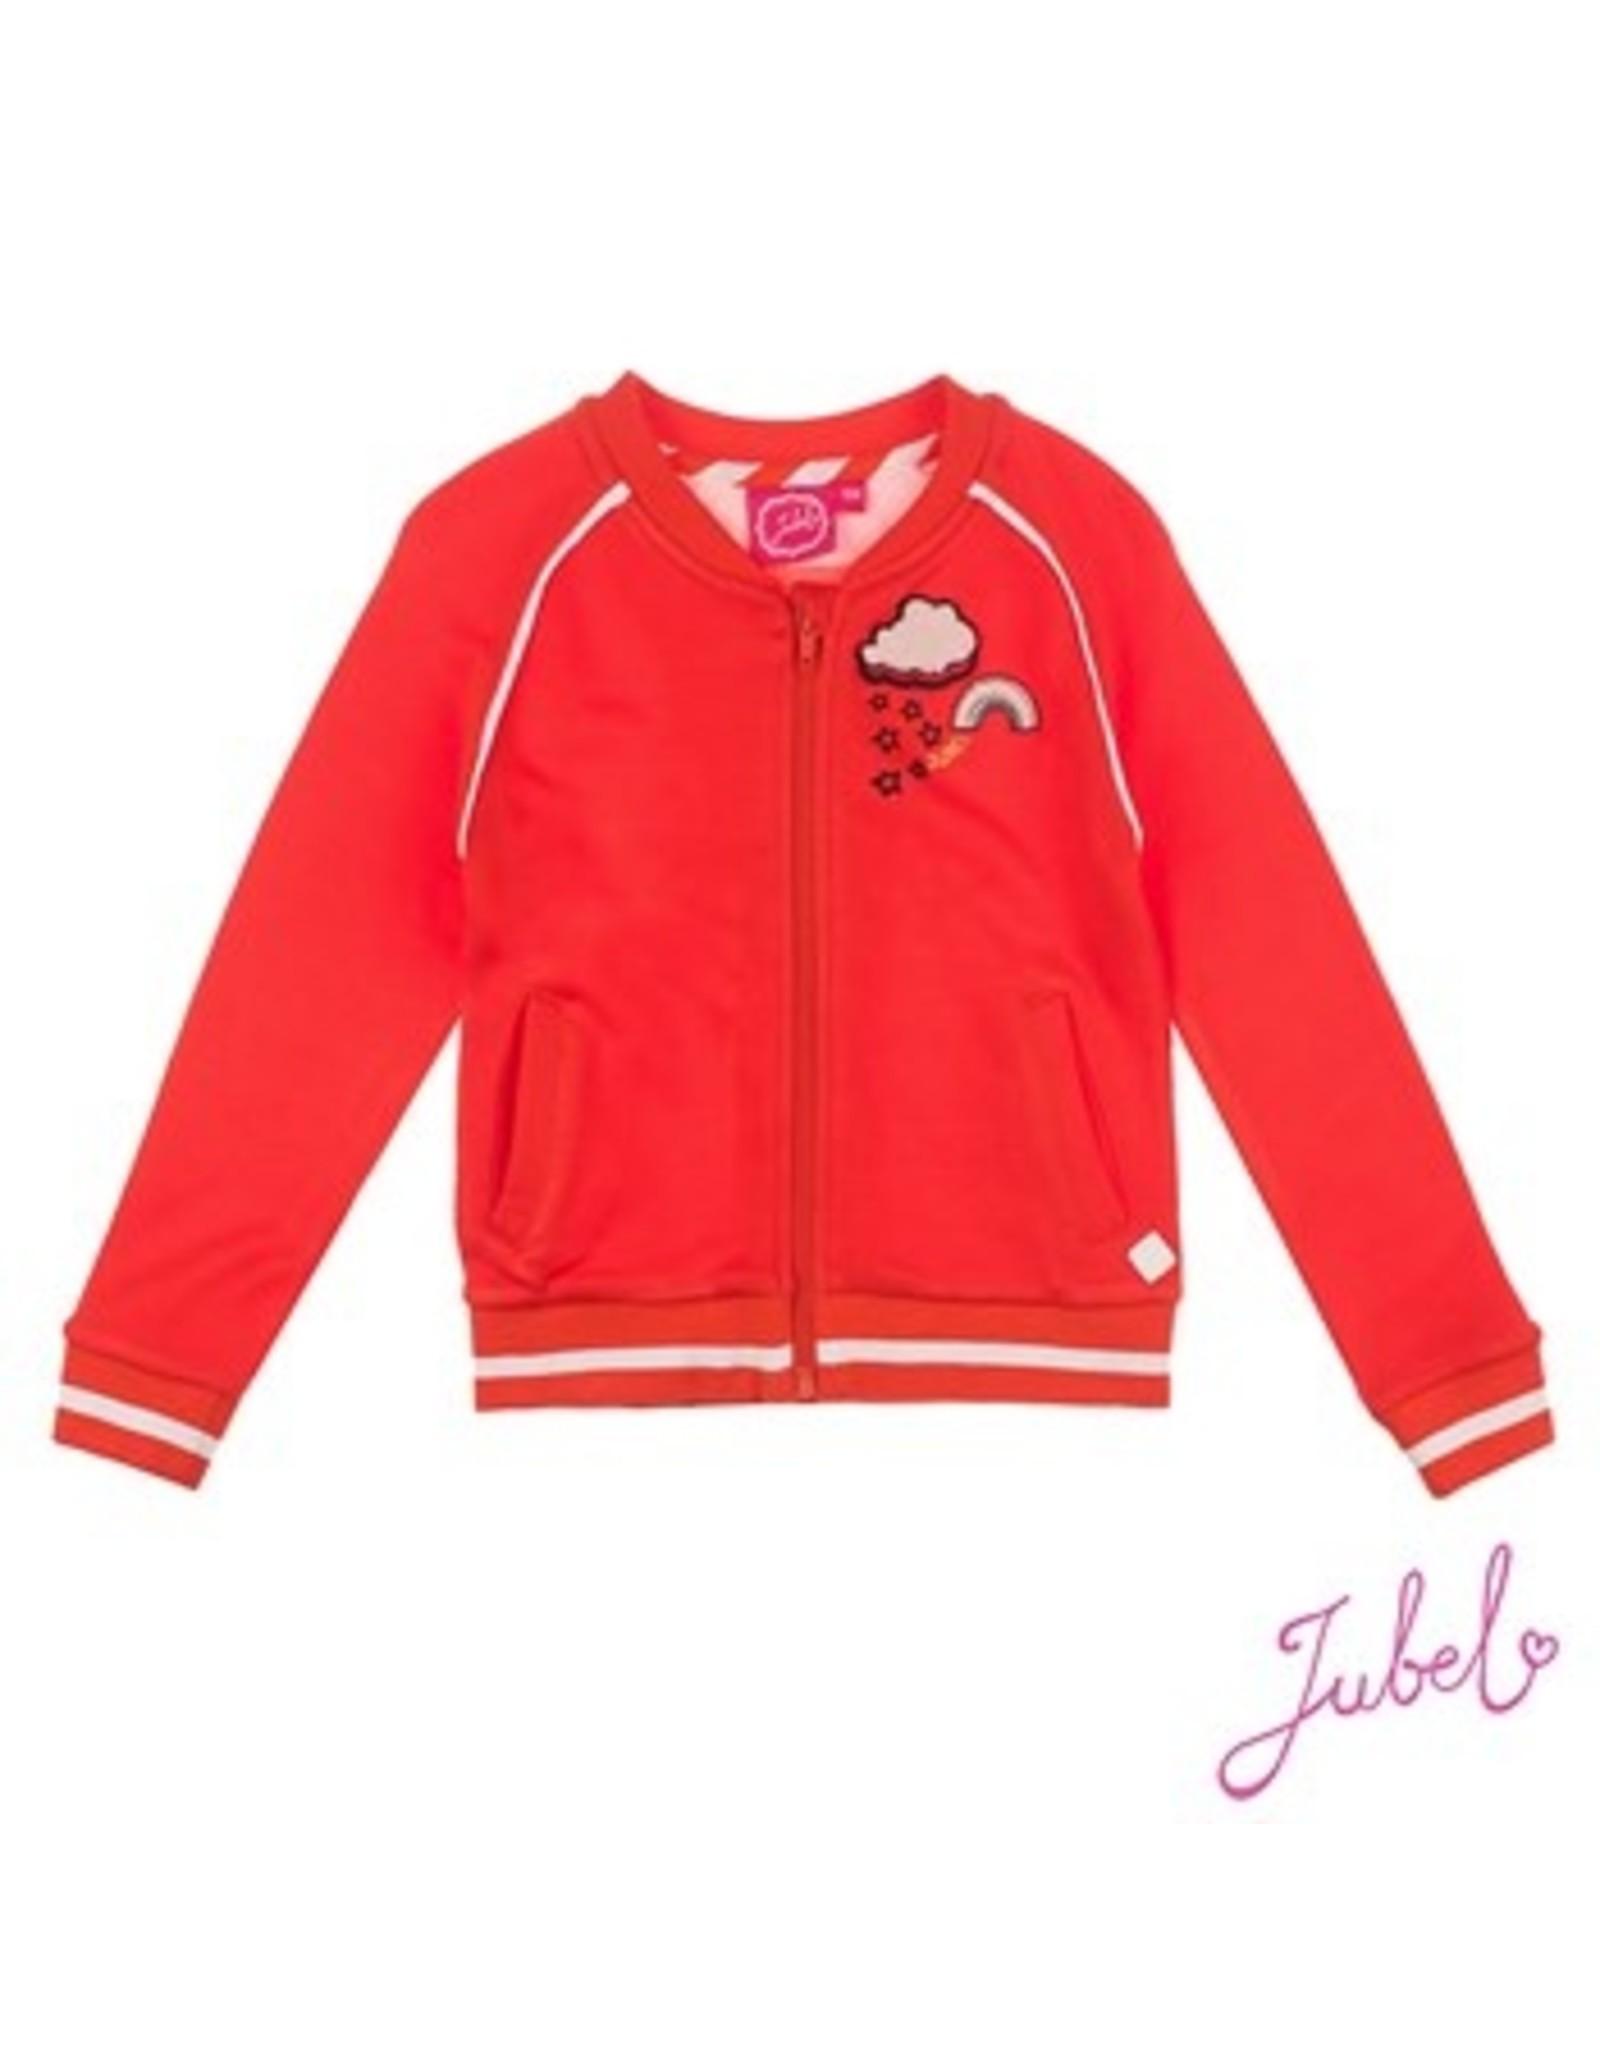 Jubel Bomberjack - Funbird